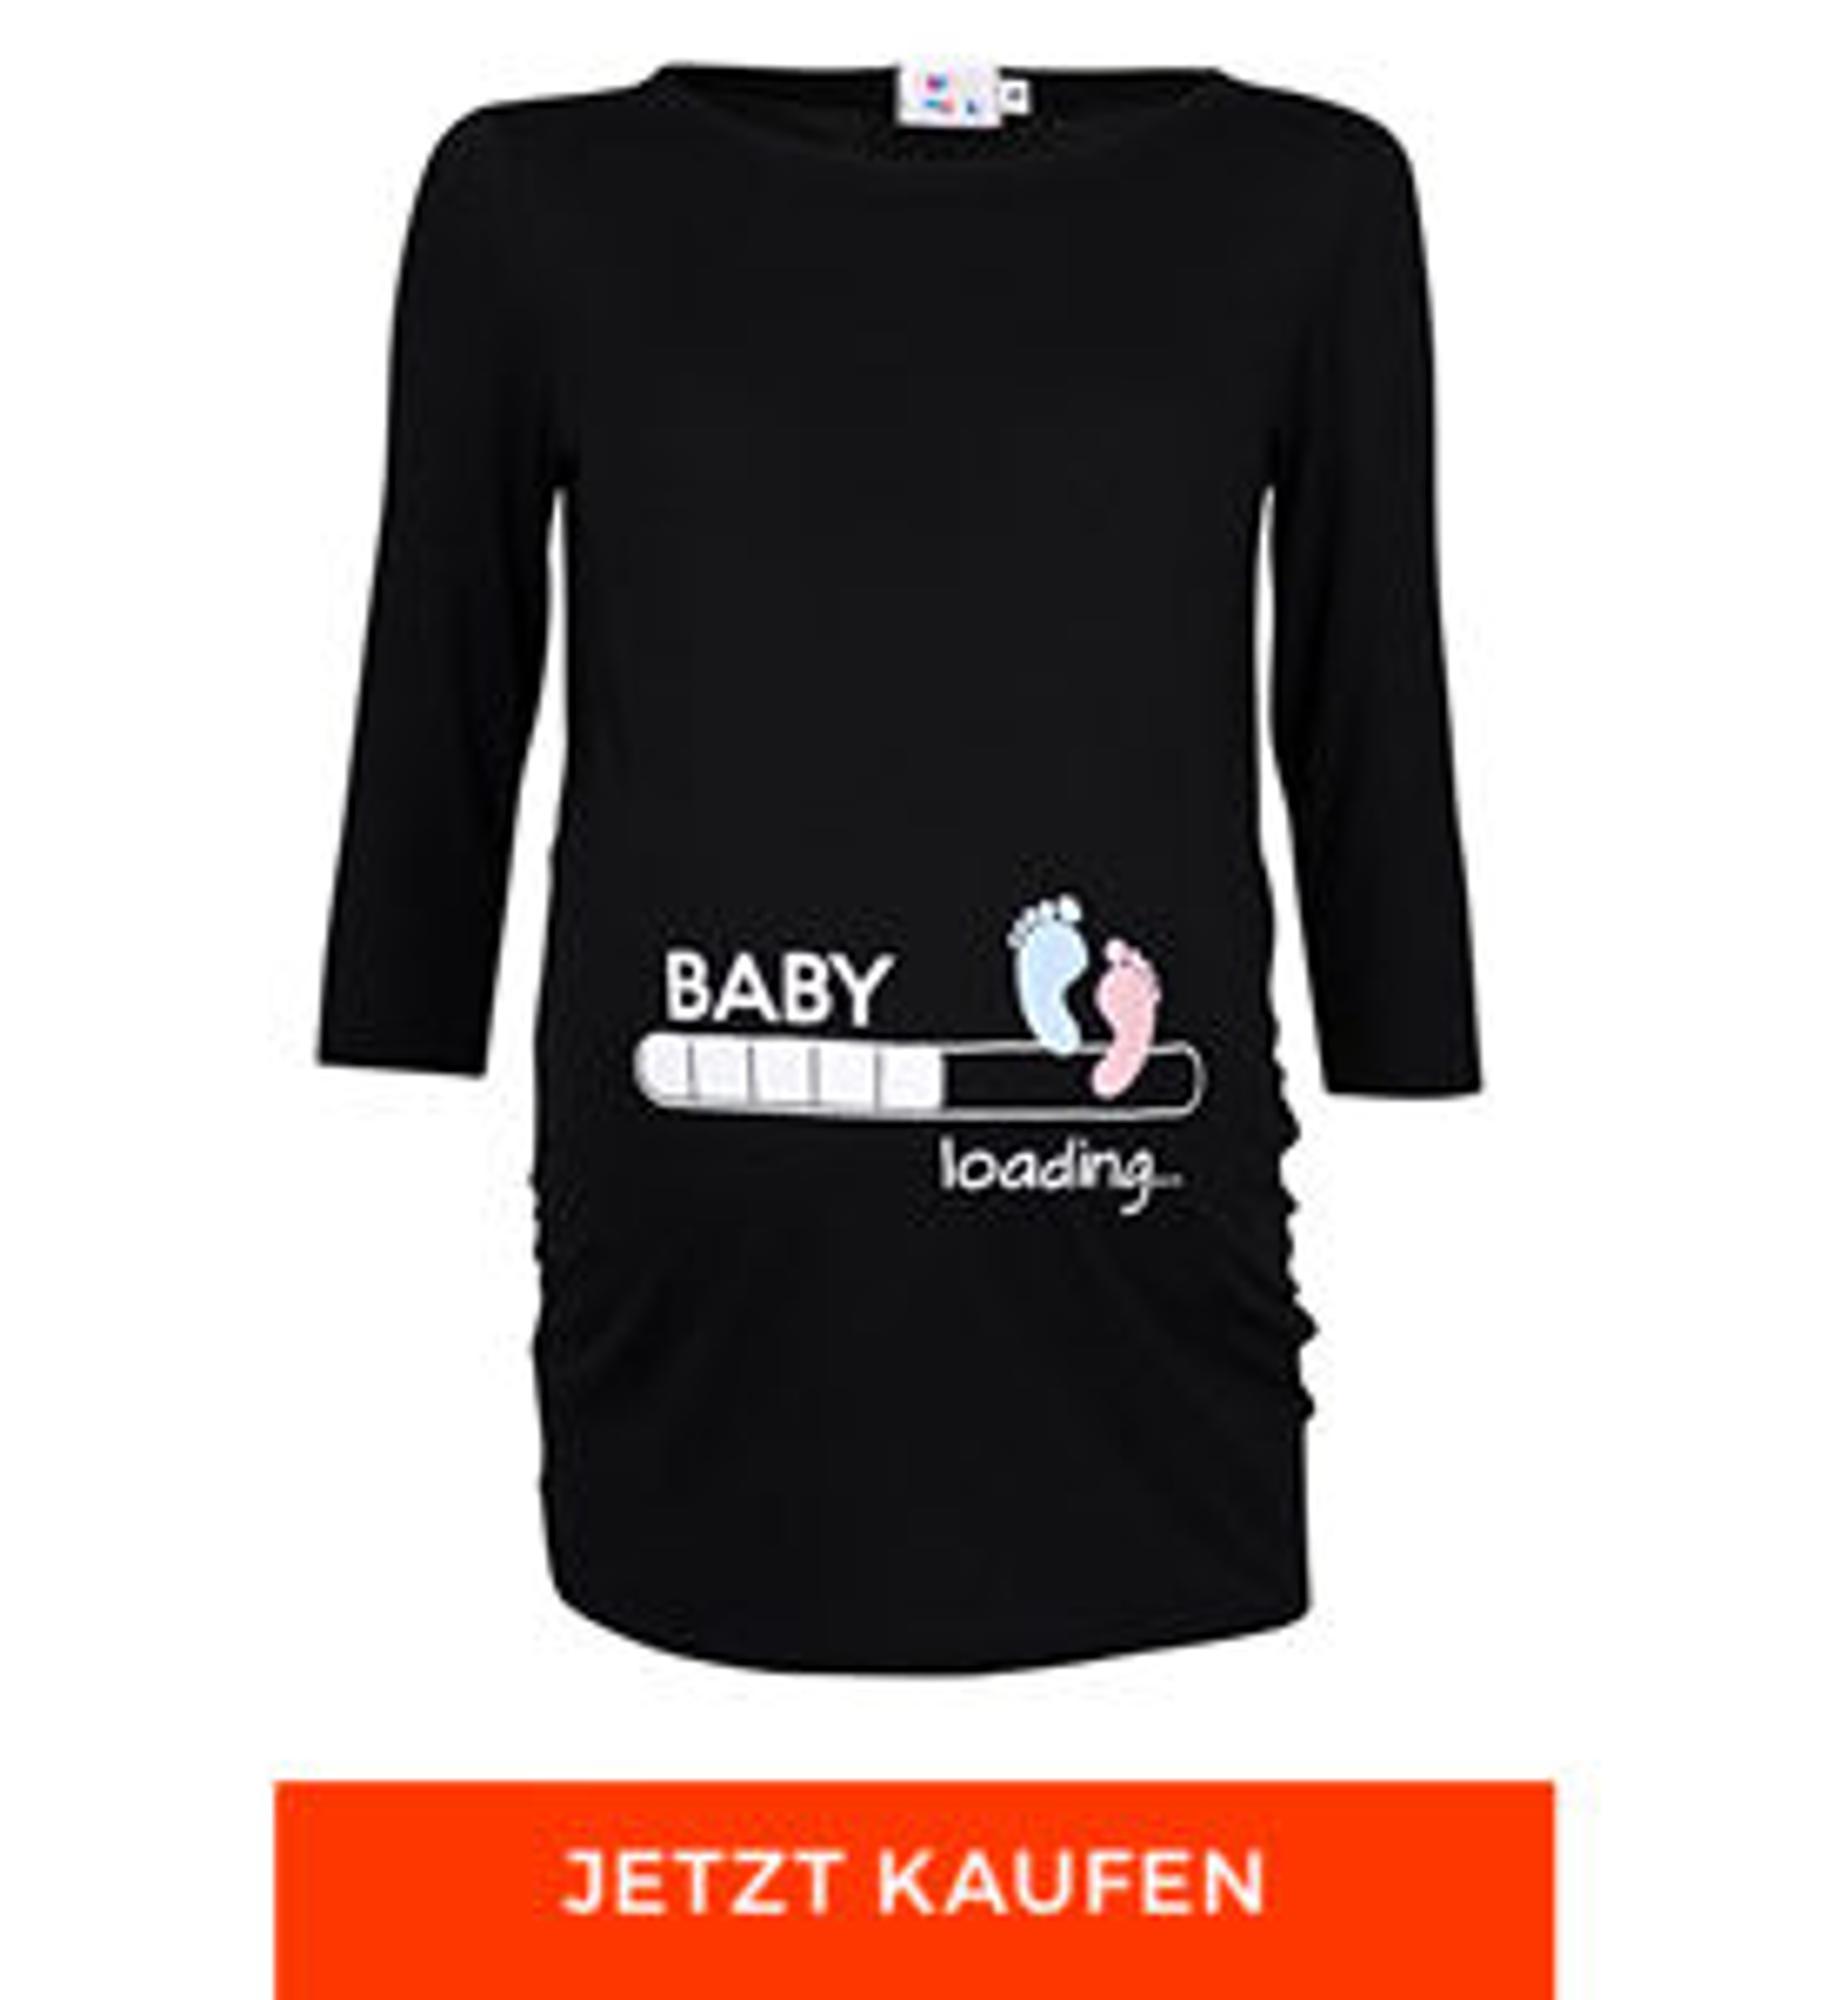 Schwangerschaft Verkünden Ideen Für Partner Eltern